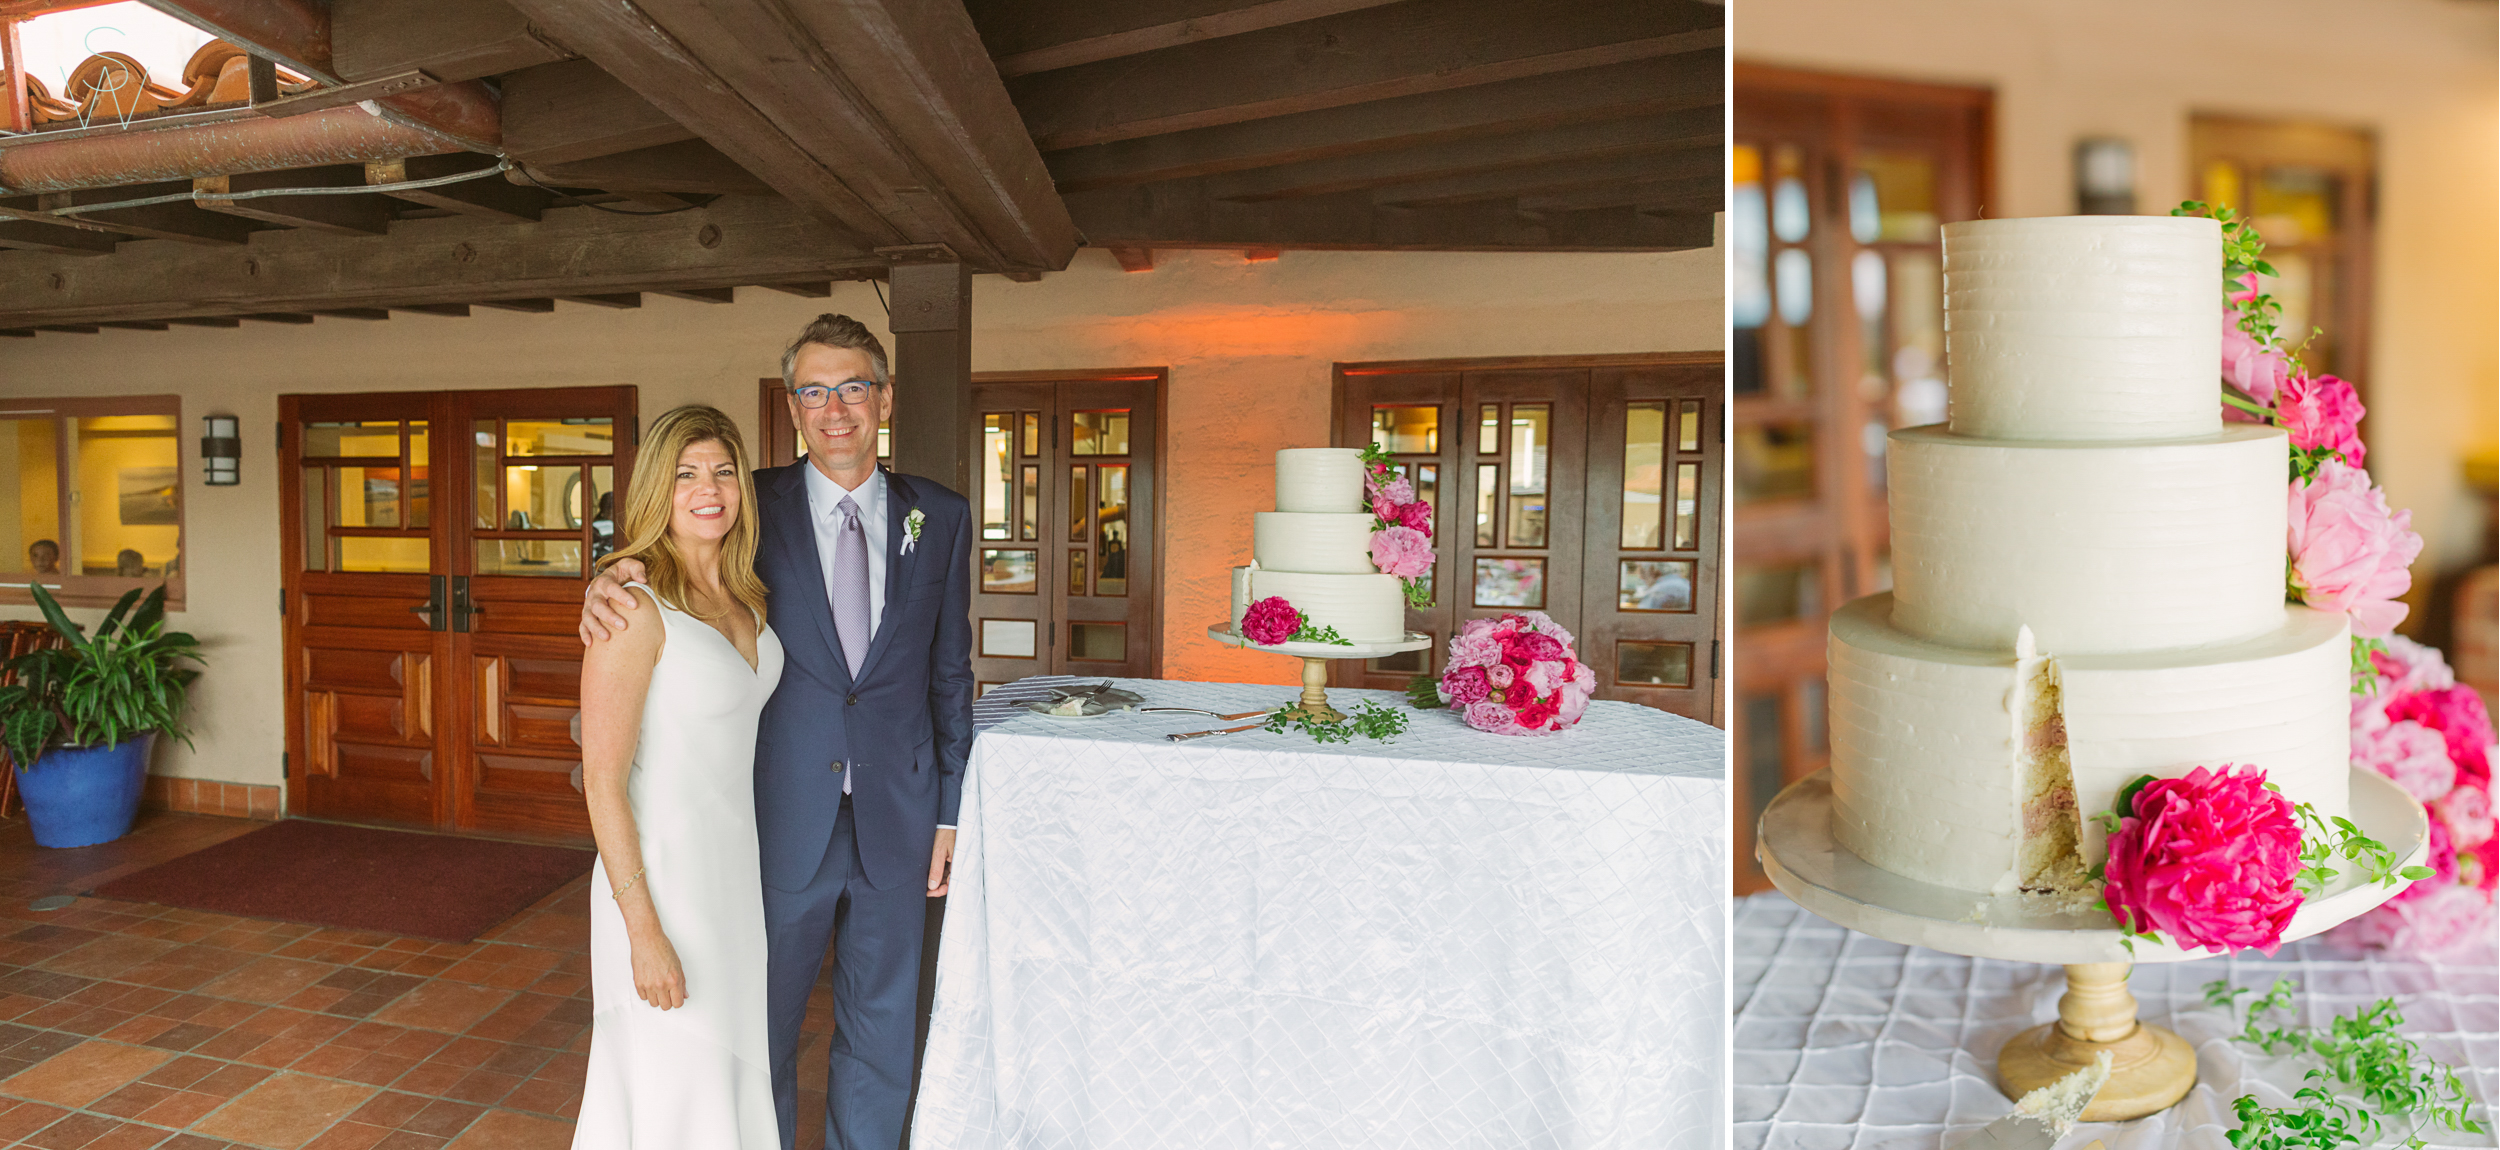 shewanders.wedding.photography.la.jolla-1056.jpg